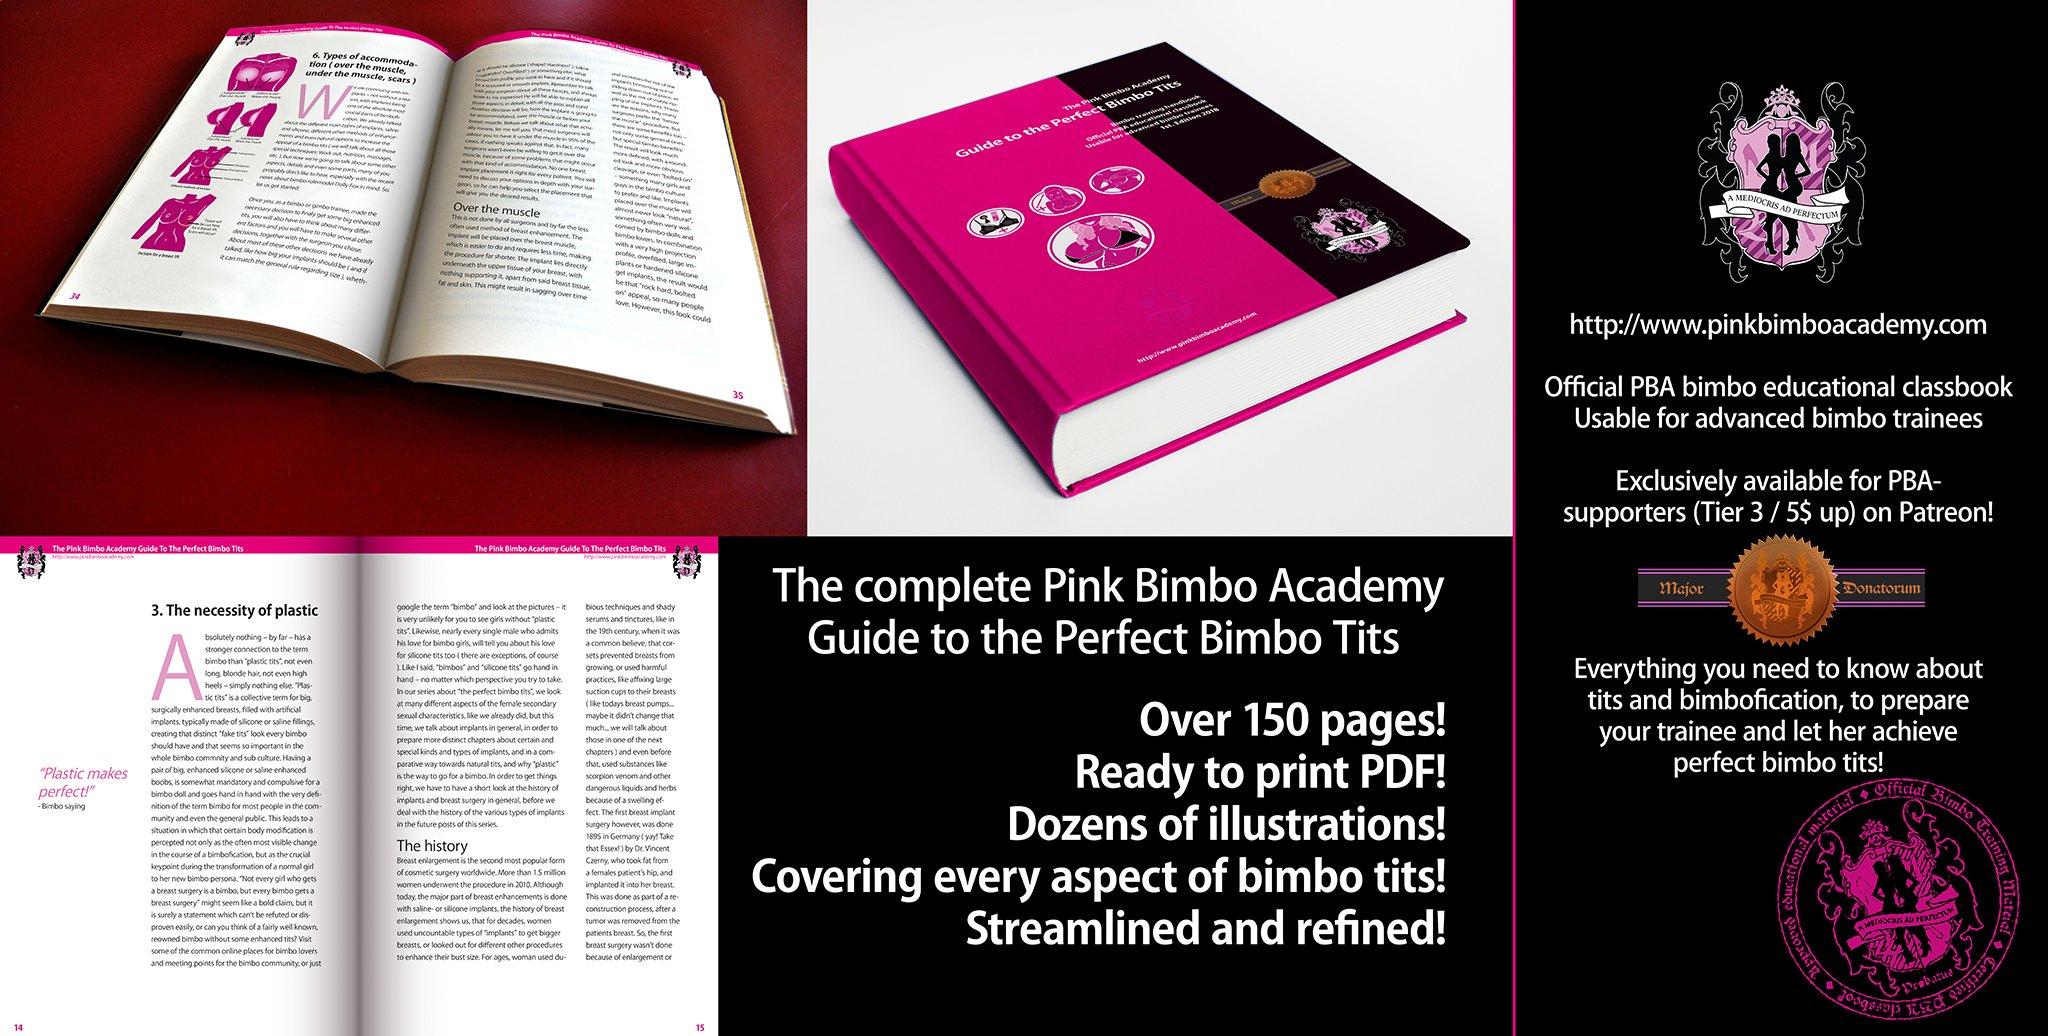 Pink Bimbo Academy on Twitter: